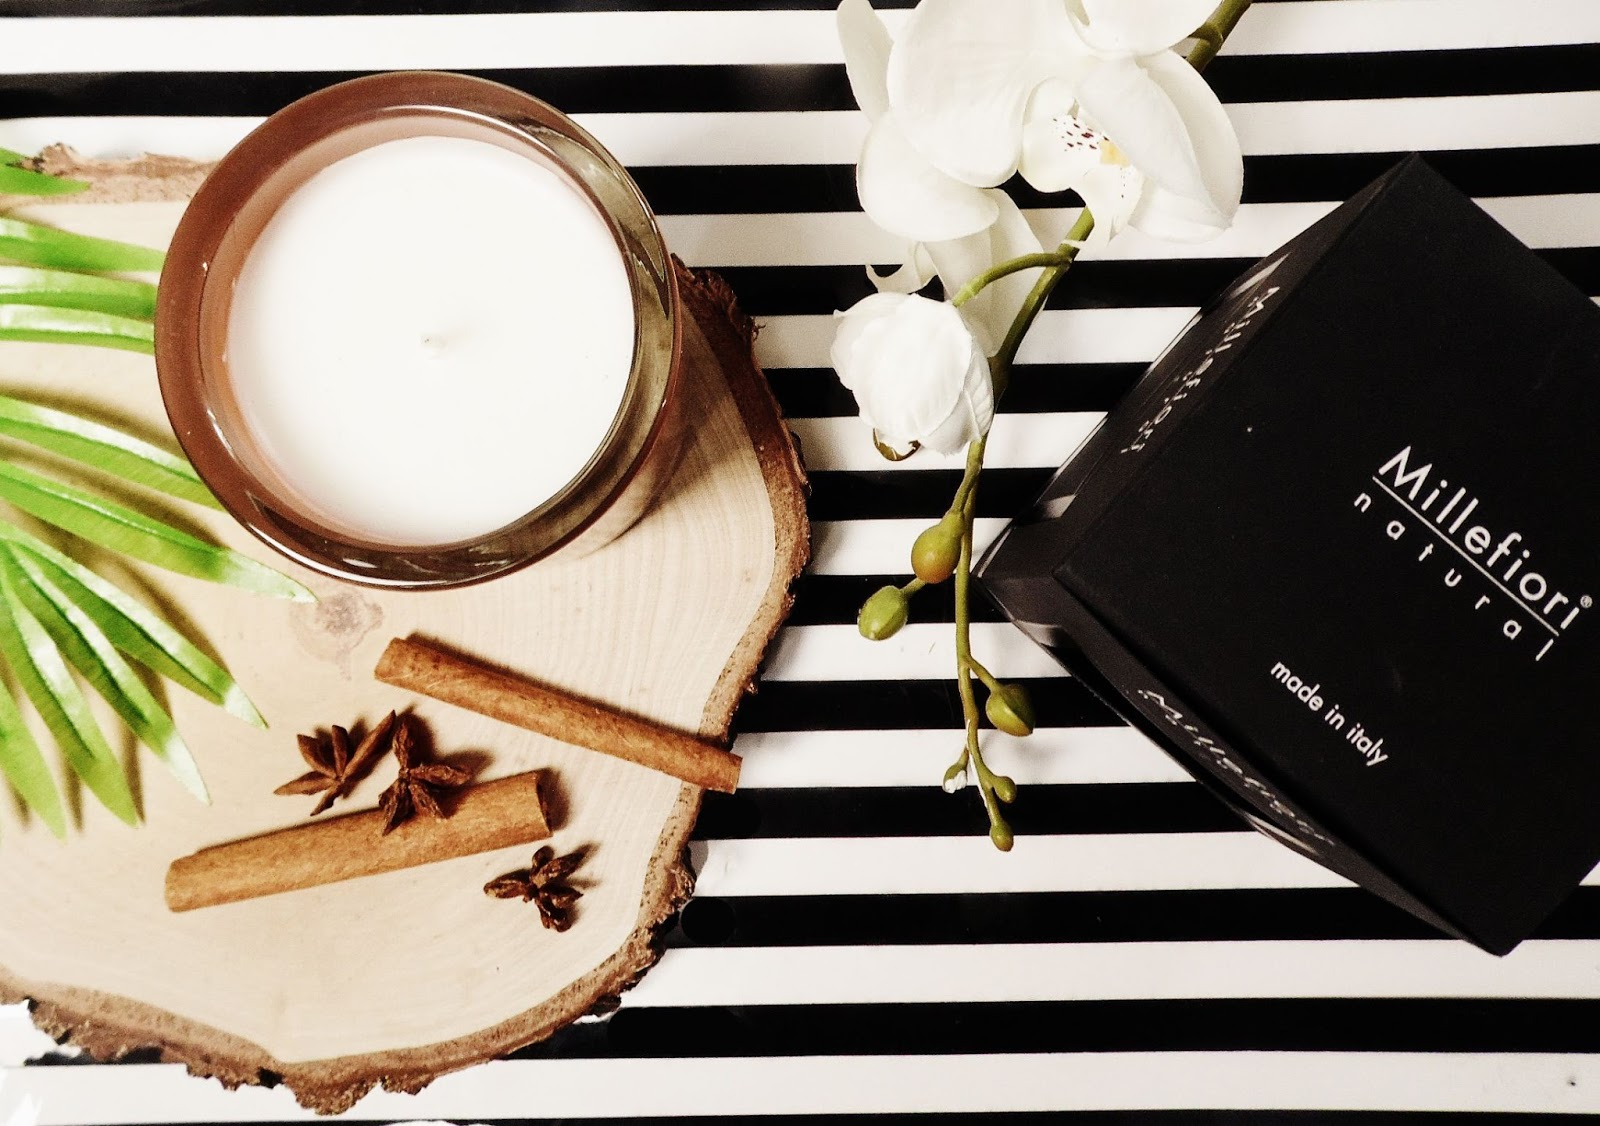 vanilla & wood millefiori milano recenzja